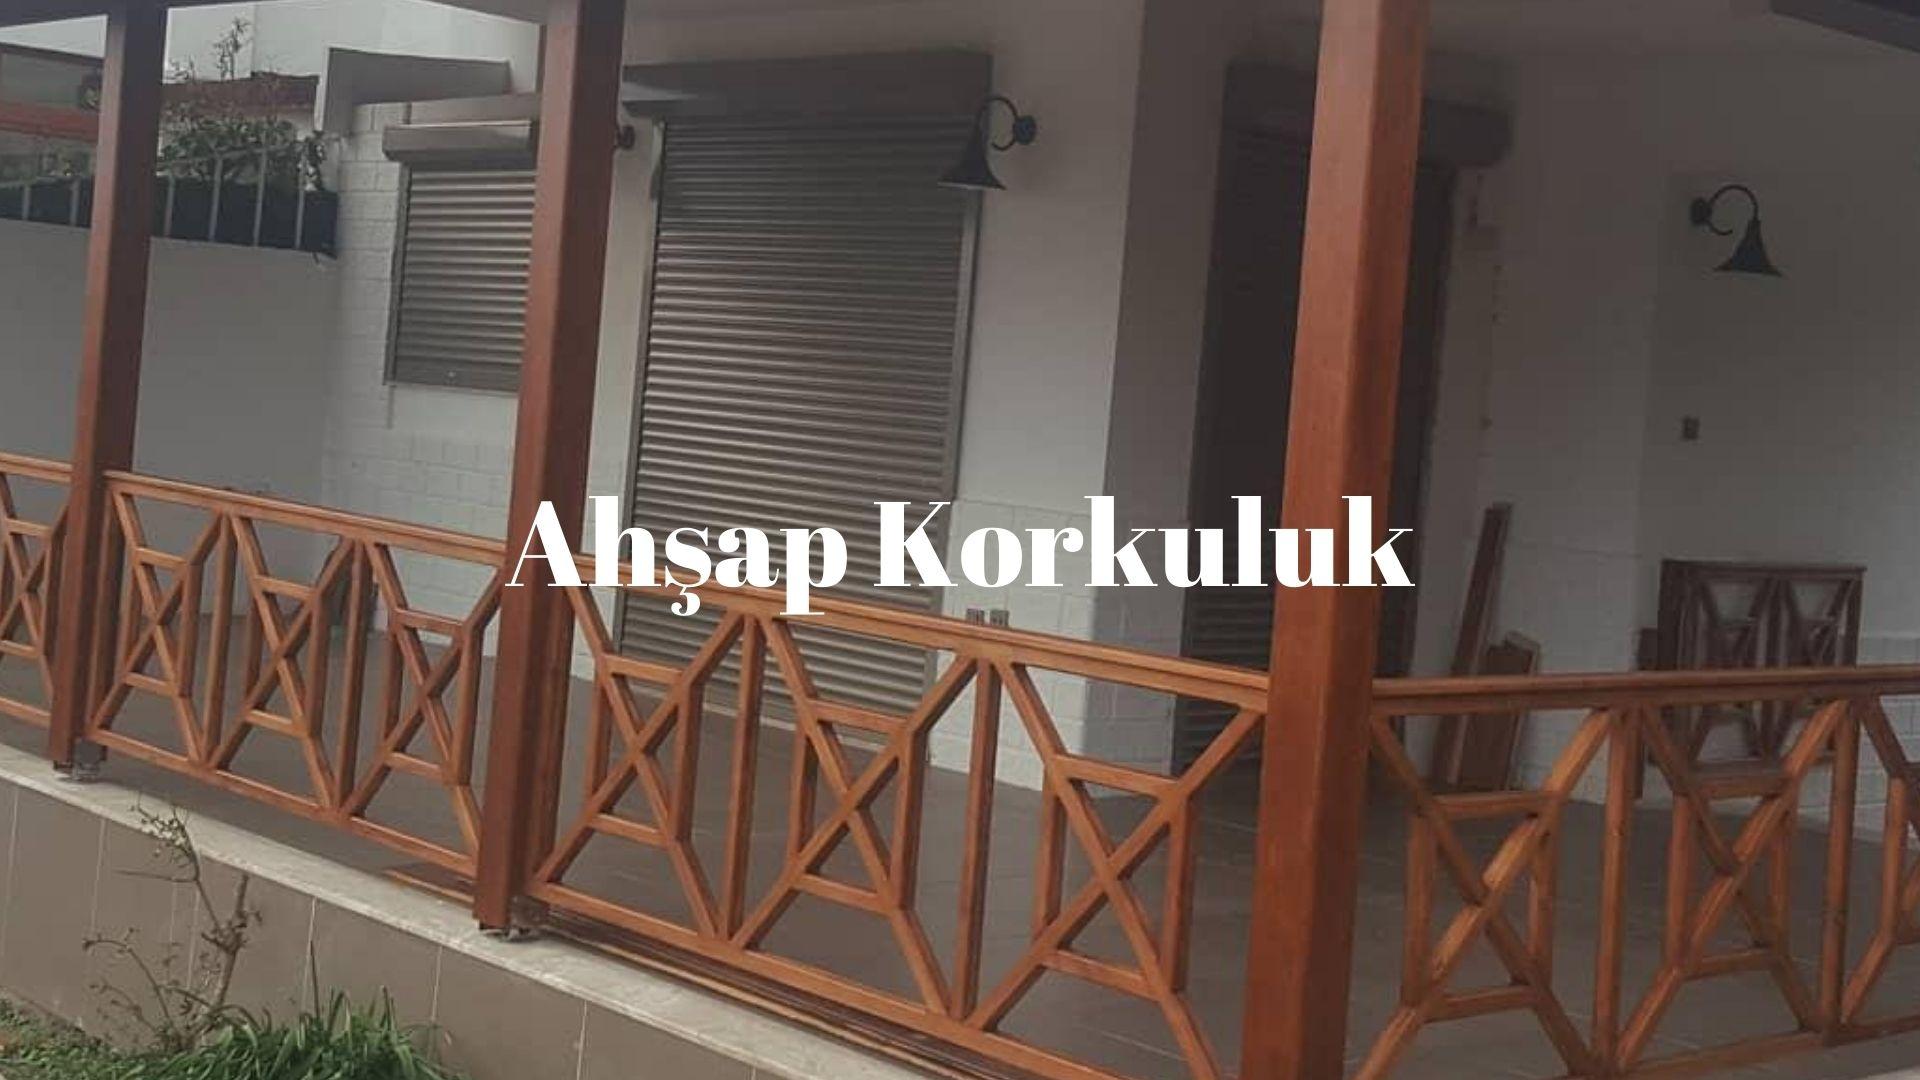 Ahşap korkuluk sistemleri İzmir